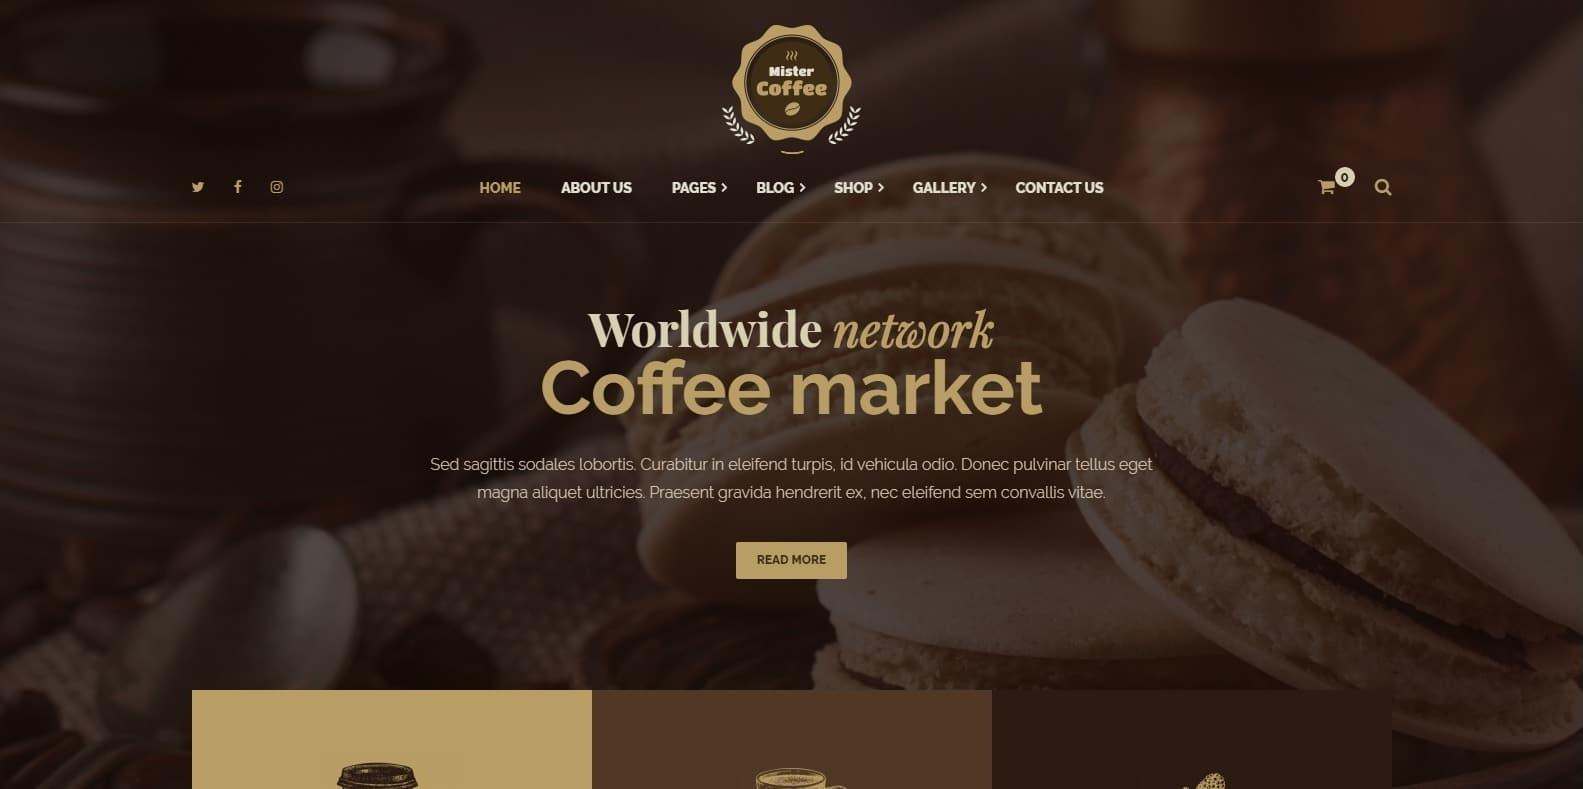 mr-coffee-market-coffee-shop-website-template